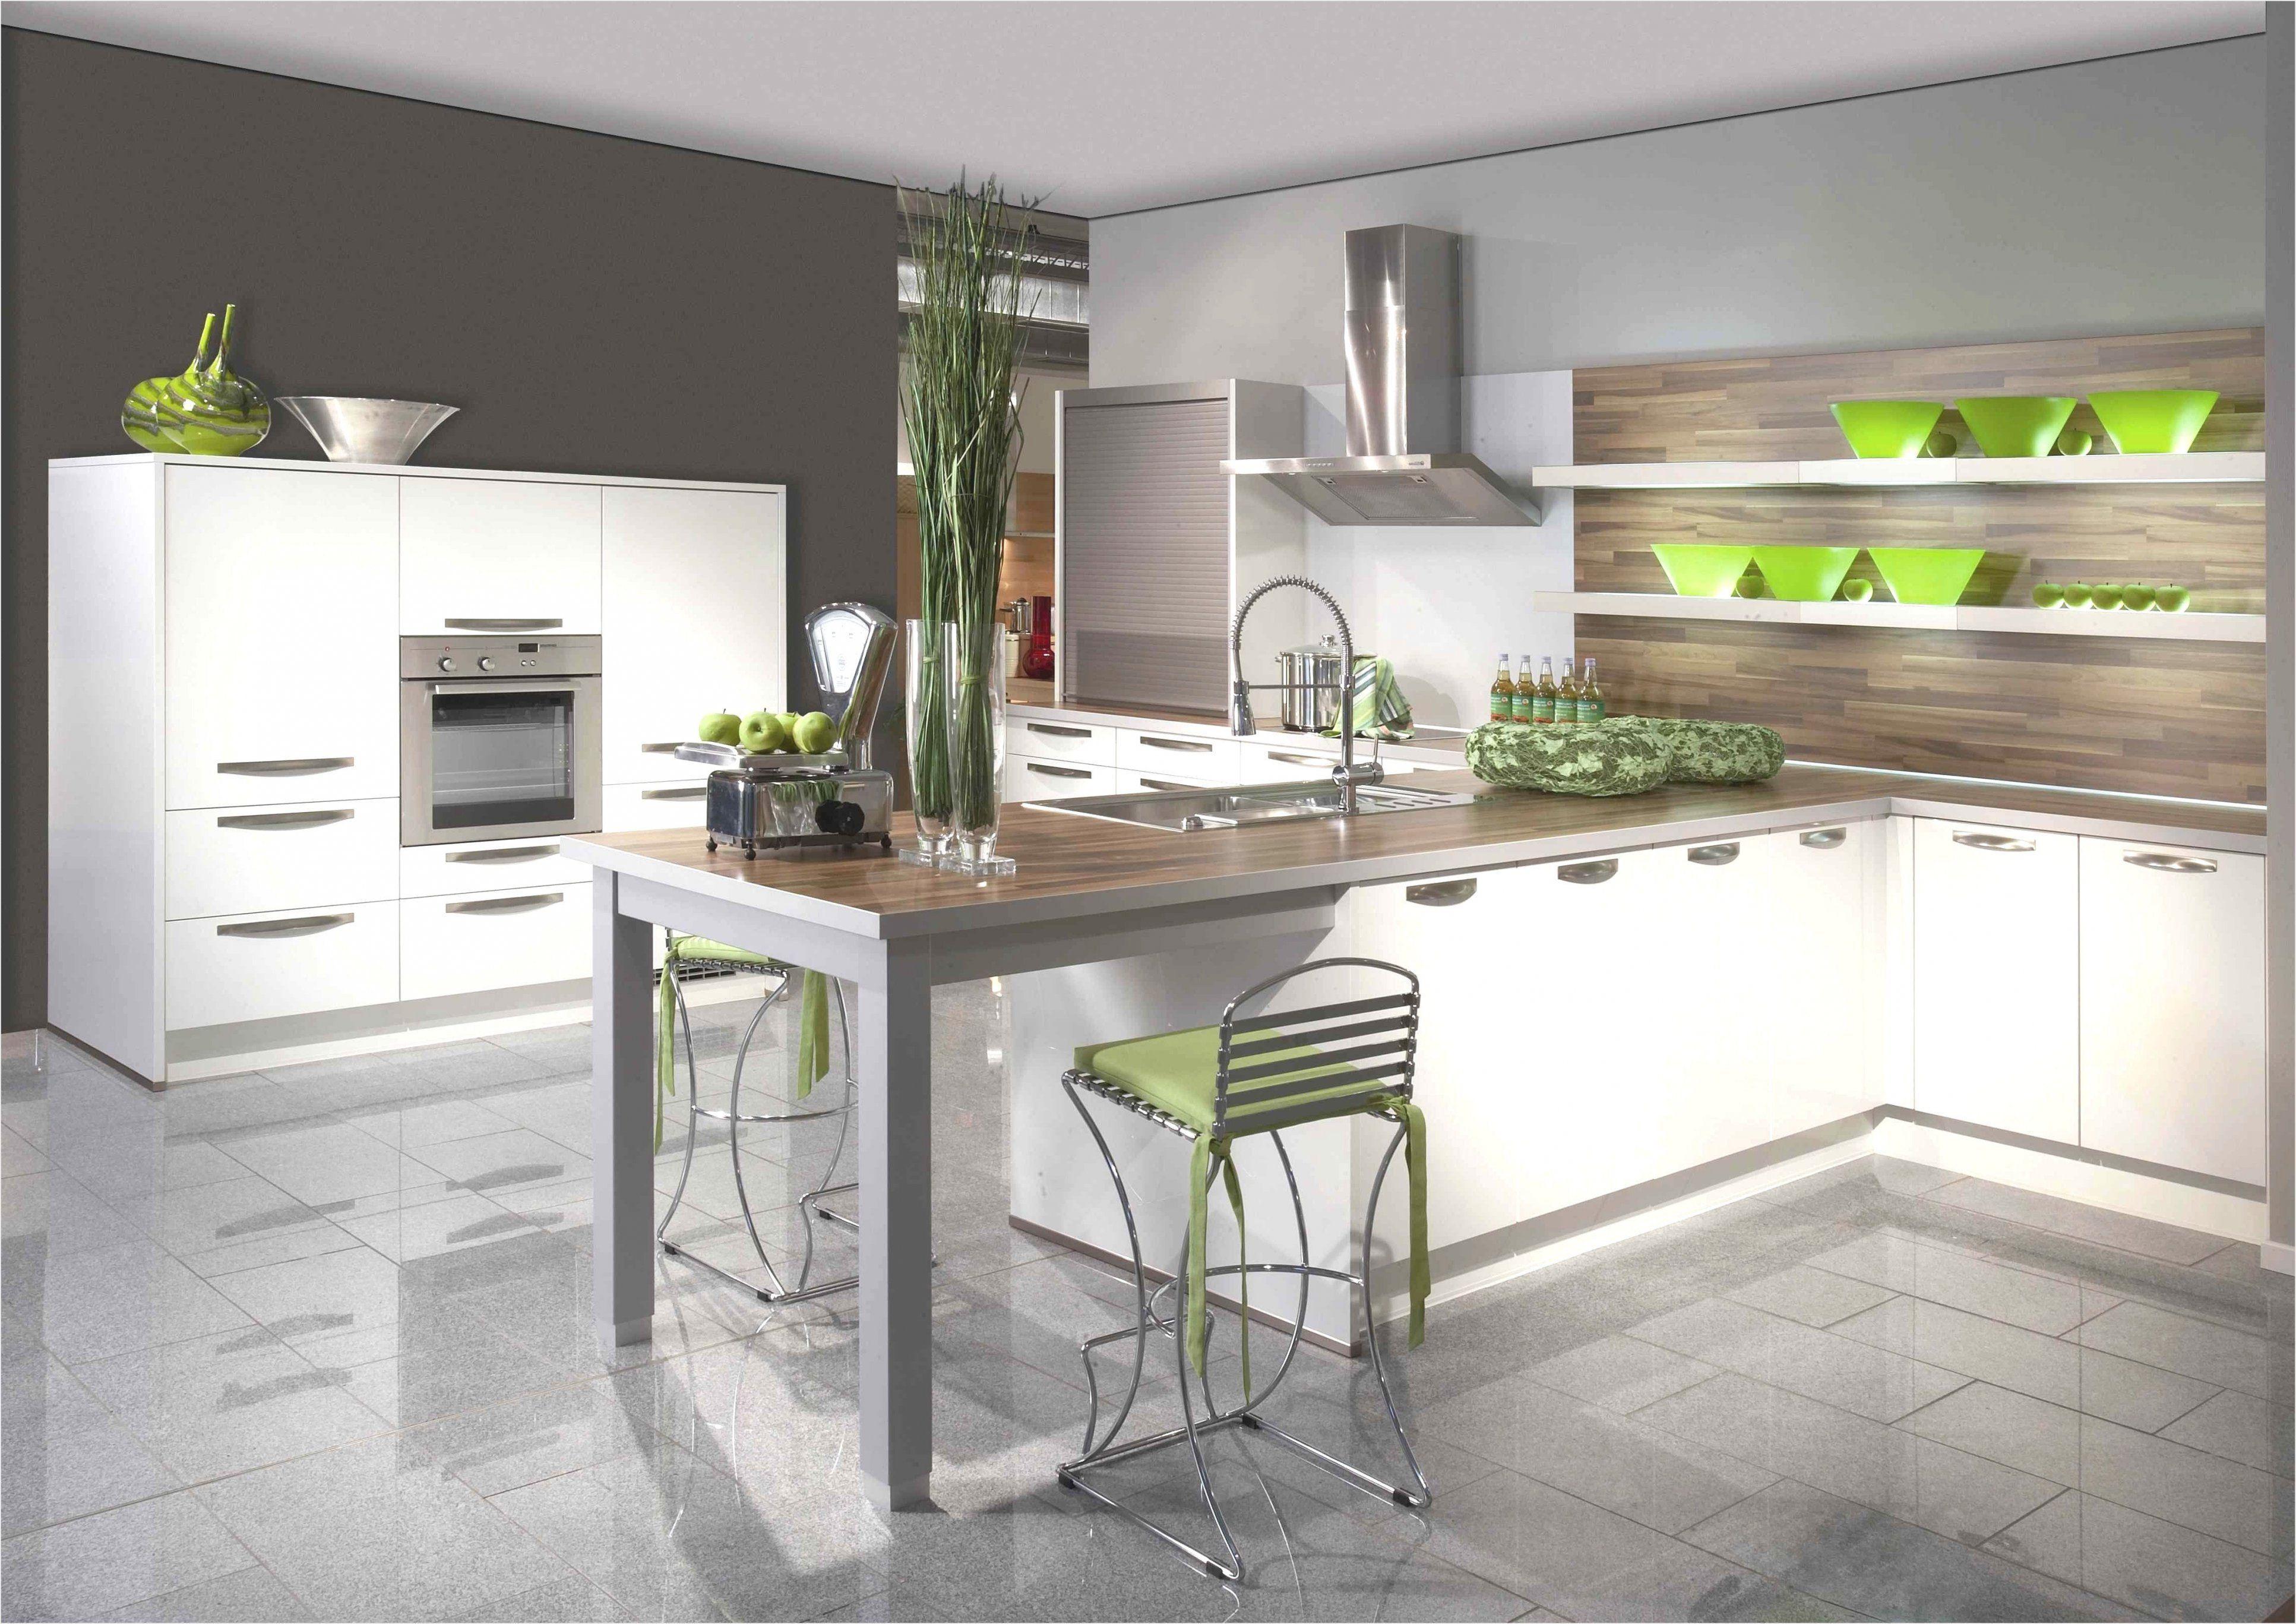 Abwaschbare Farbe Statt Fliesen Küche Cool Beautiful Abwaschbare